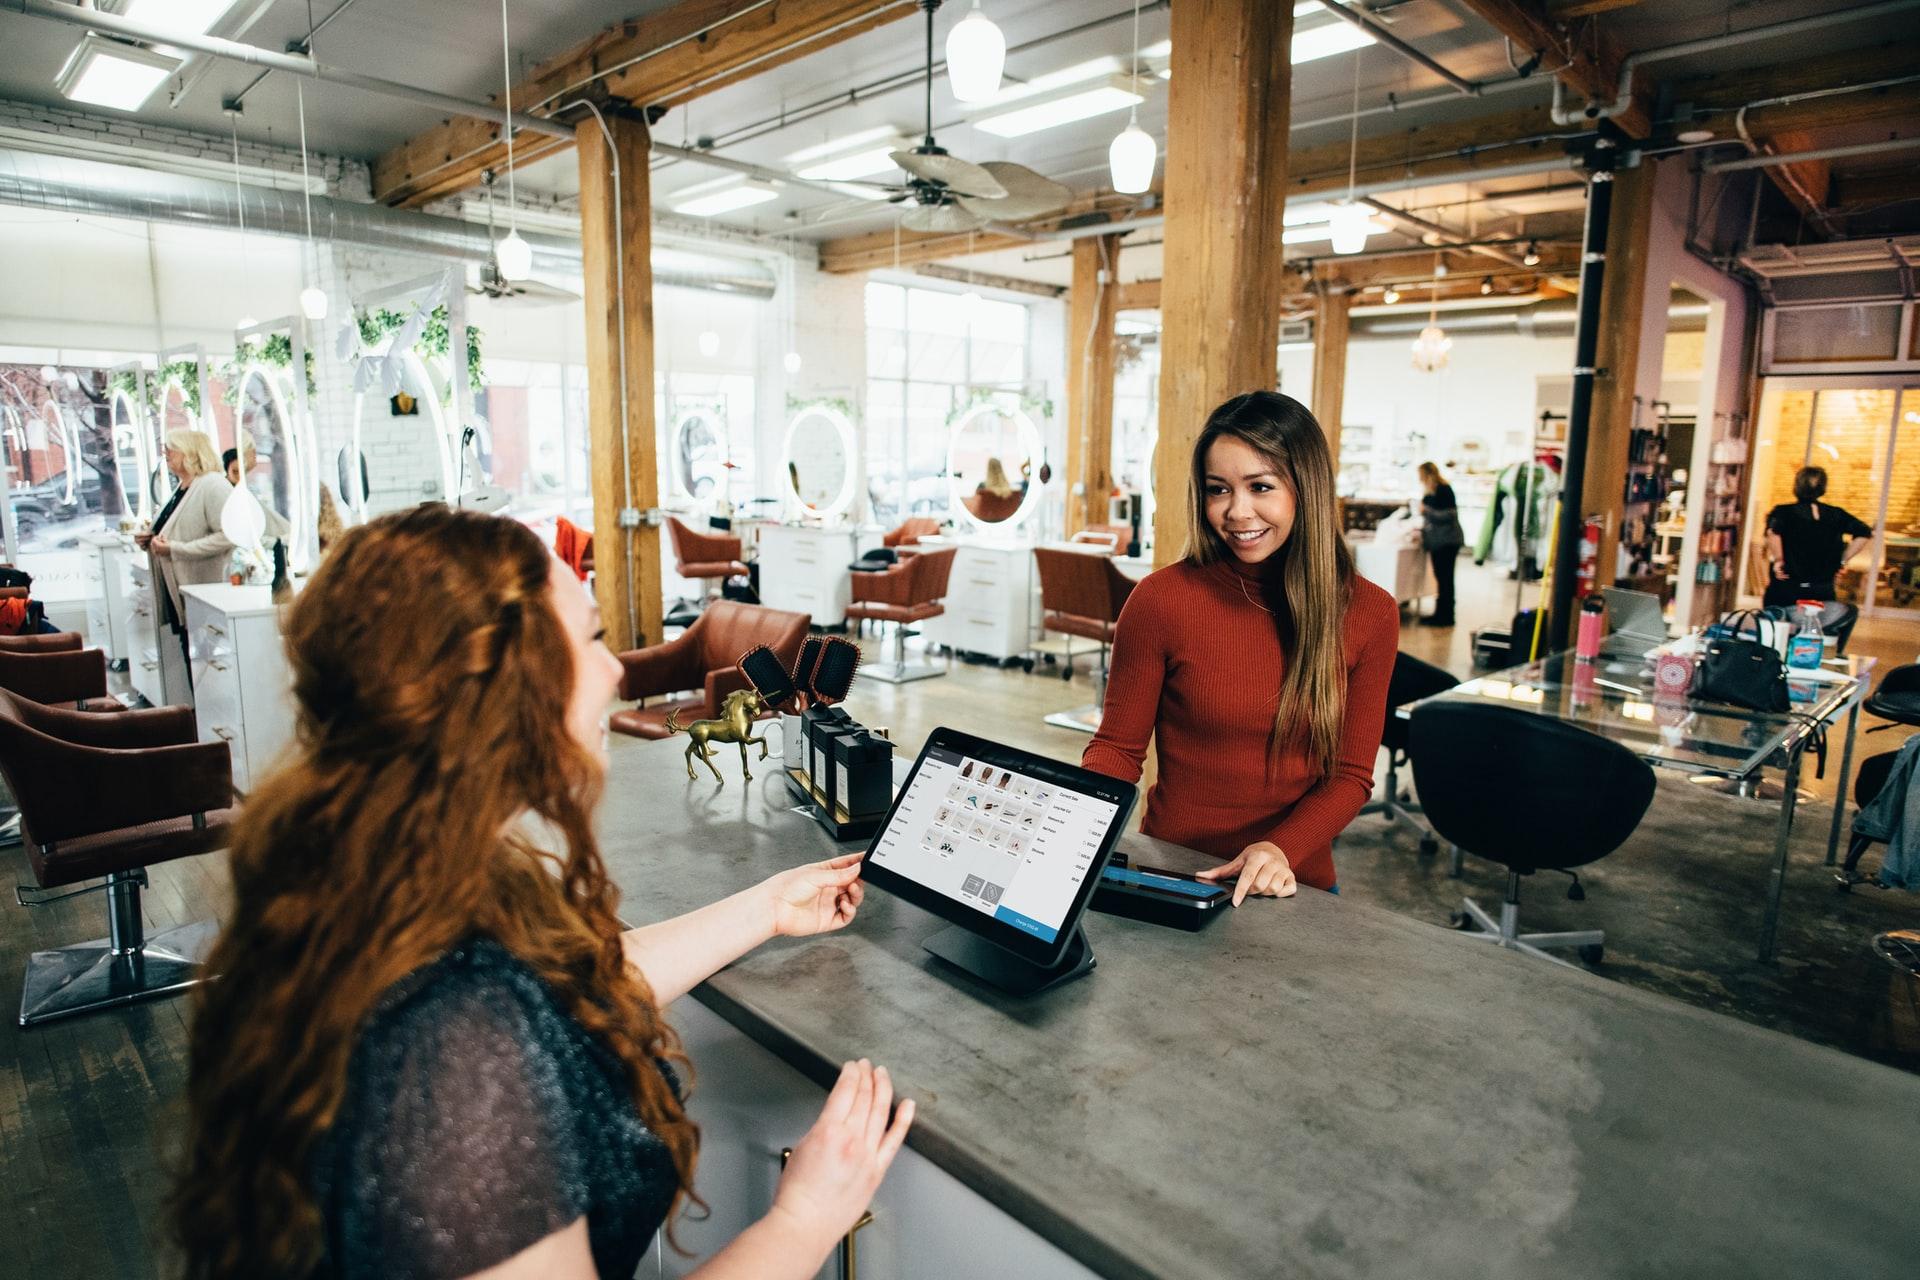 A customer making a purchase.